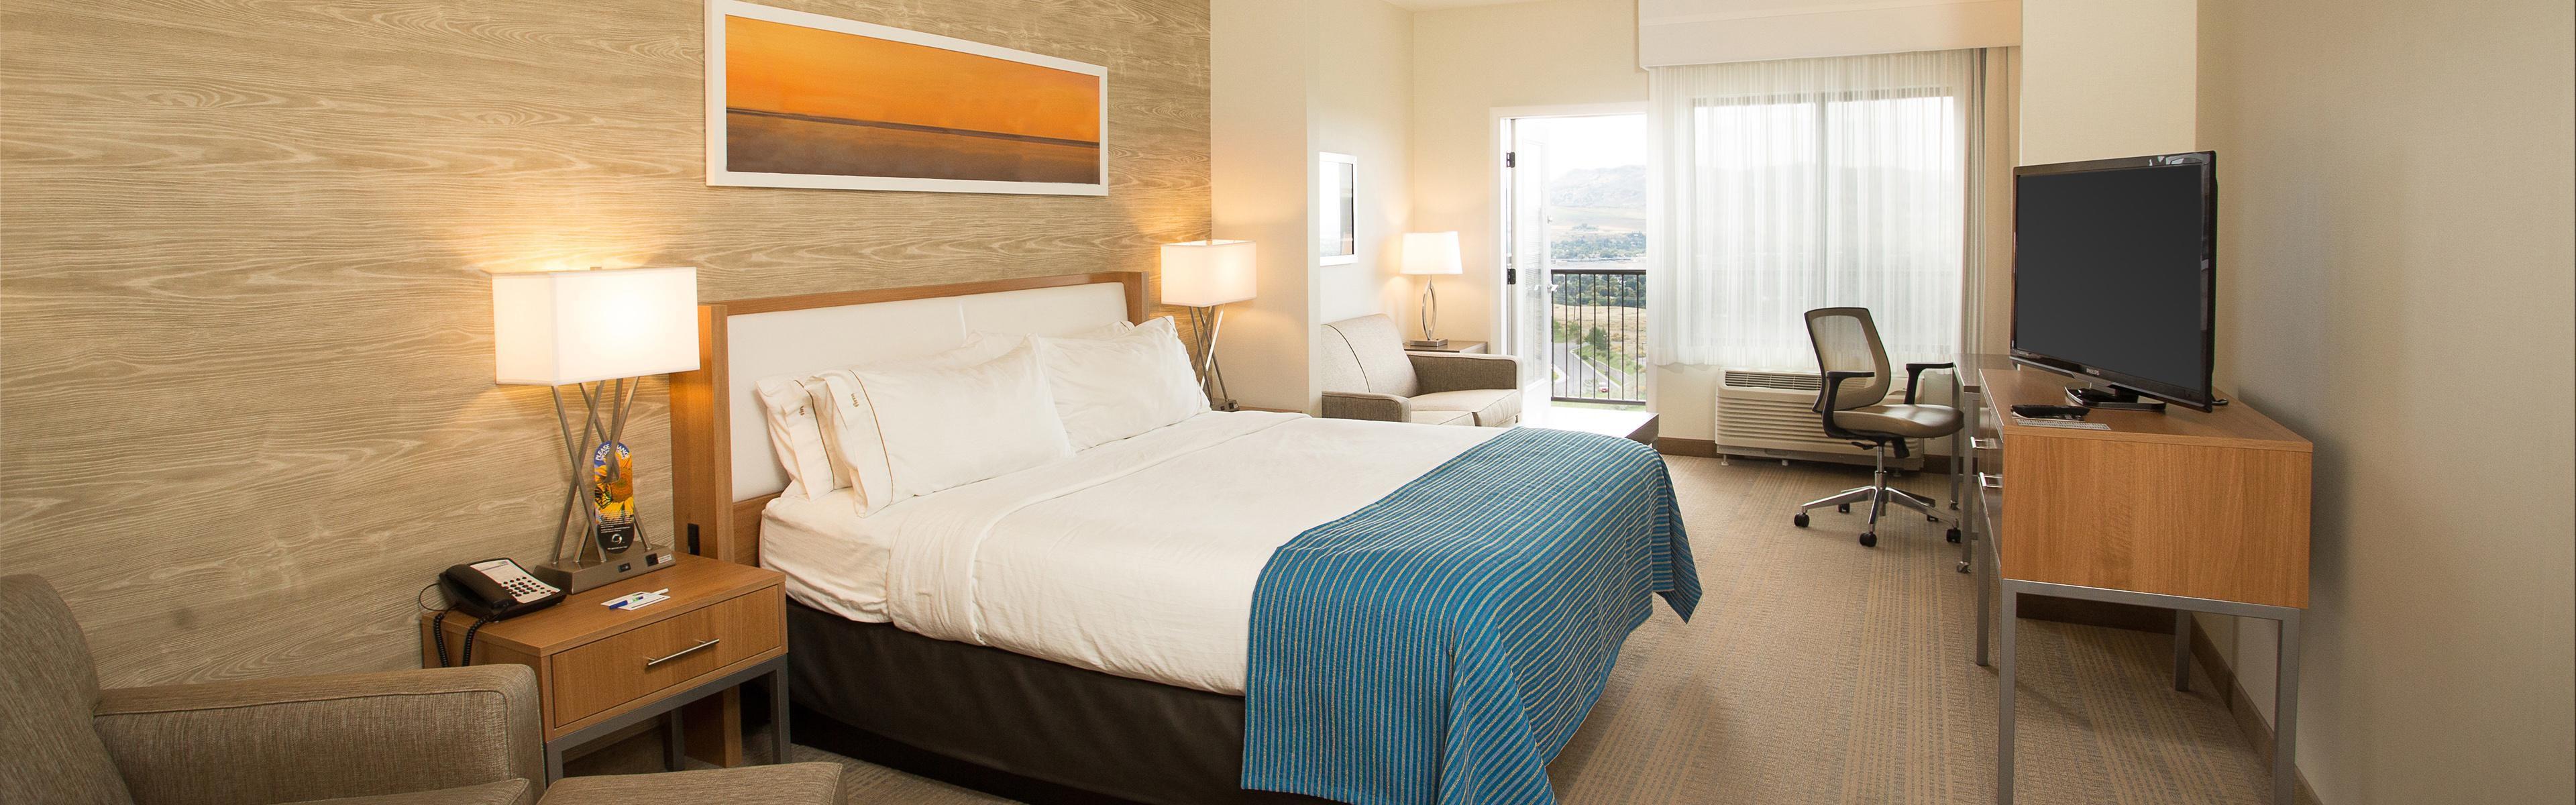 Holiday Inn Express & Suites Pocatello image 1